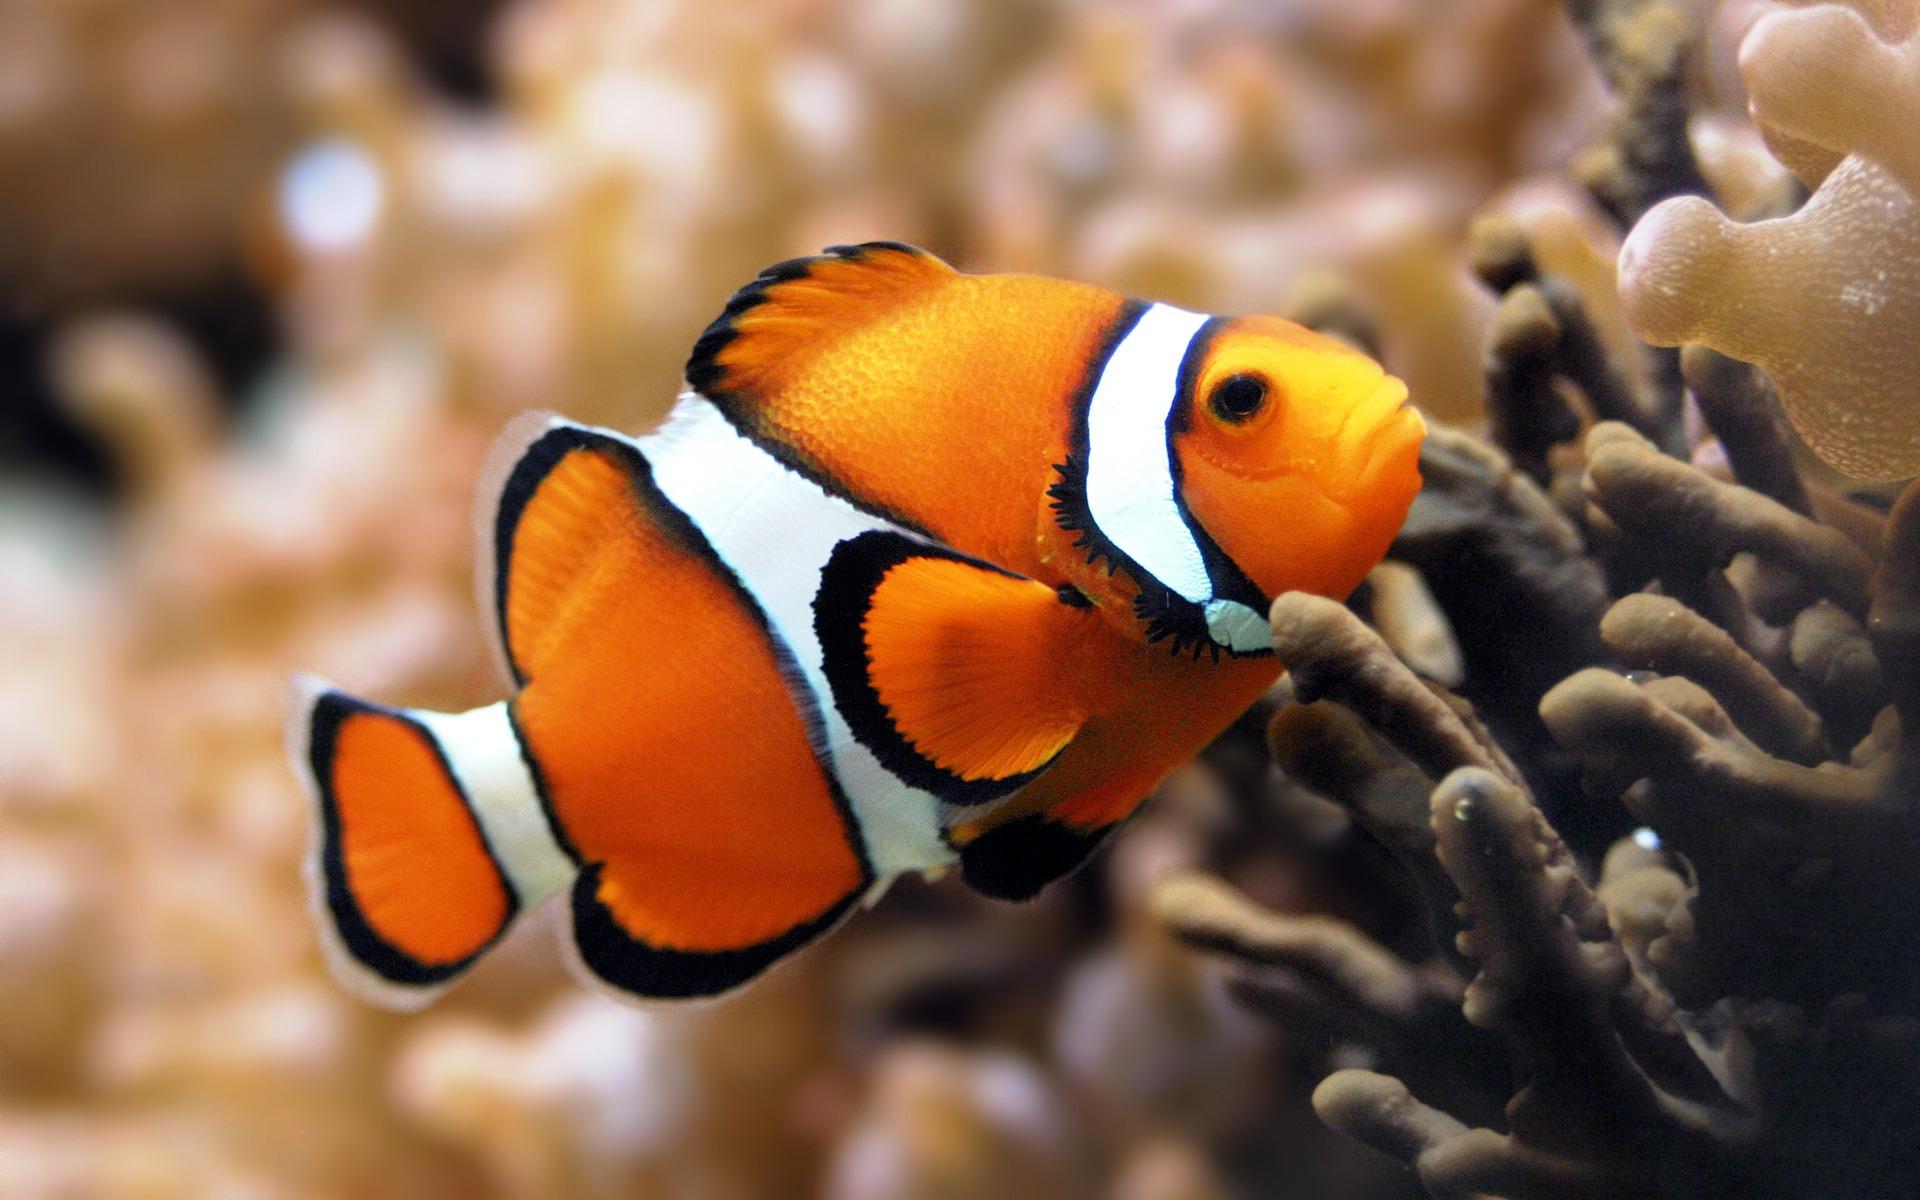 Poisson clown - Image poissons ...